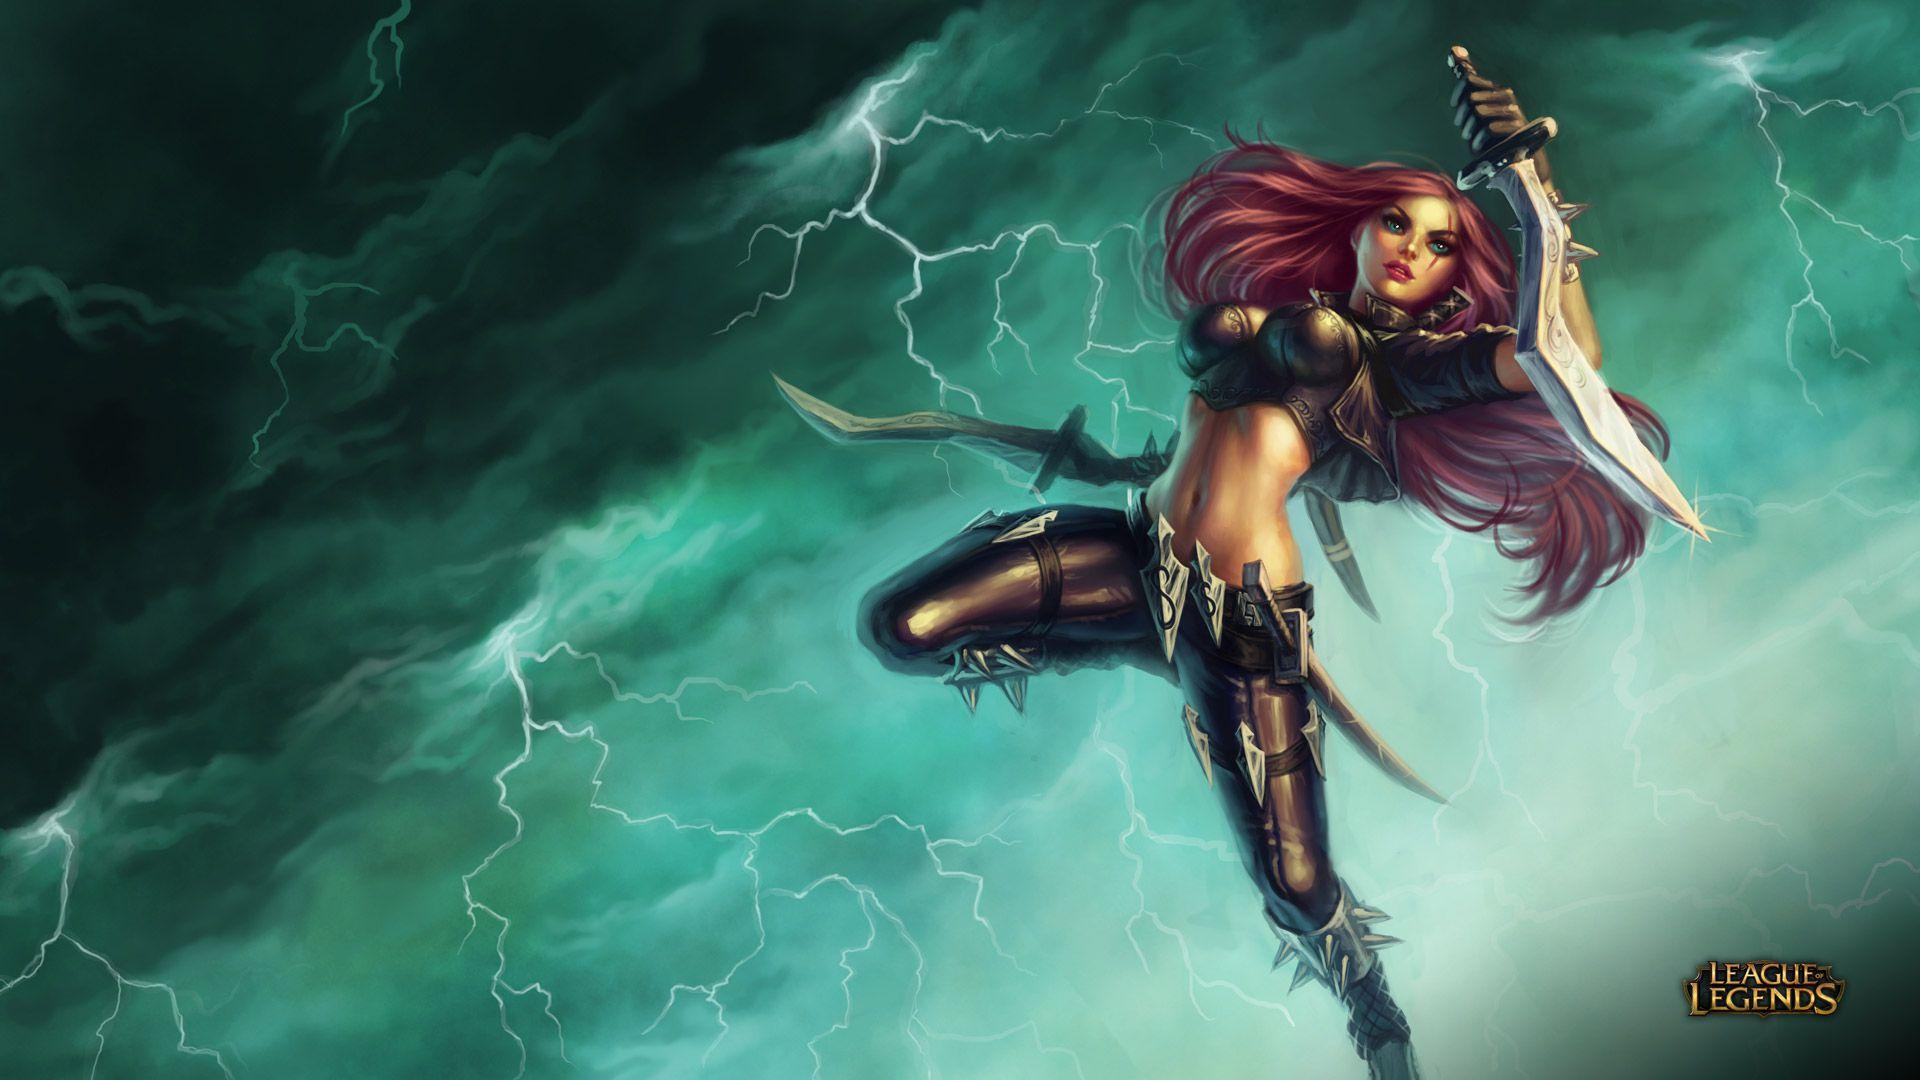 Katarina - League of Legends Wallpapers